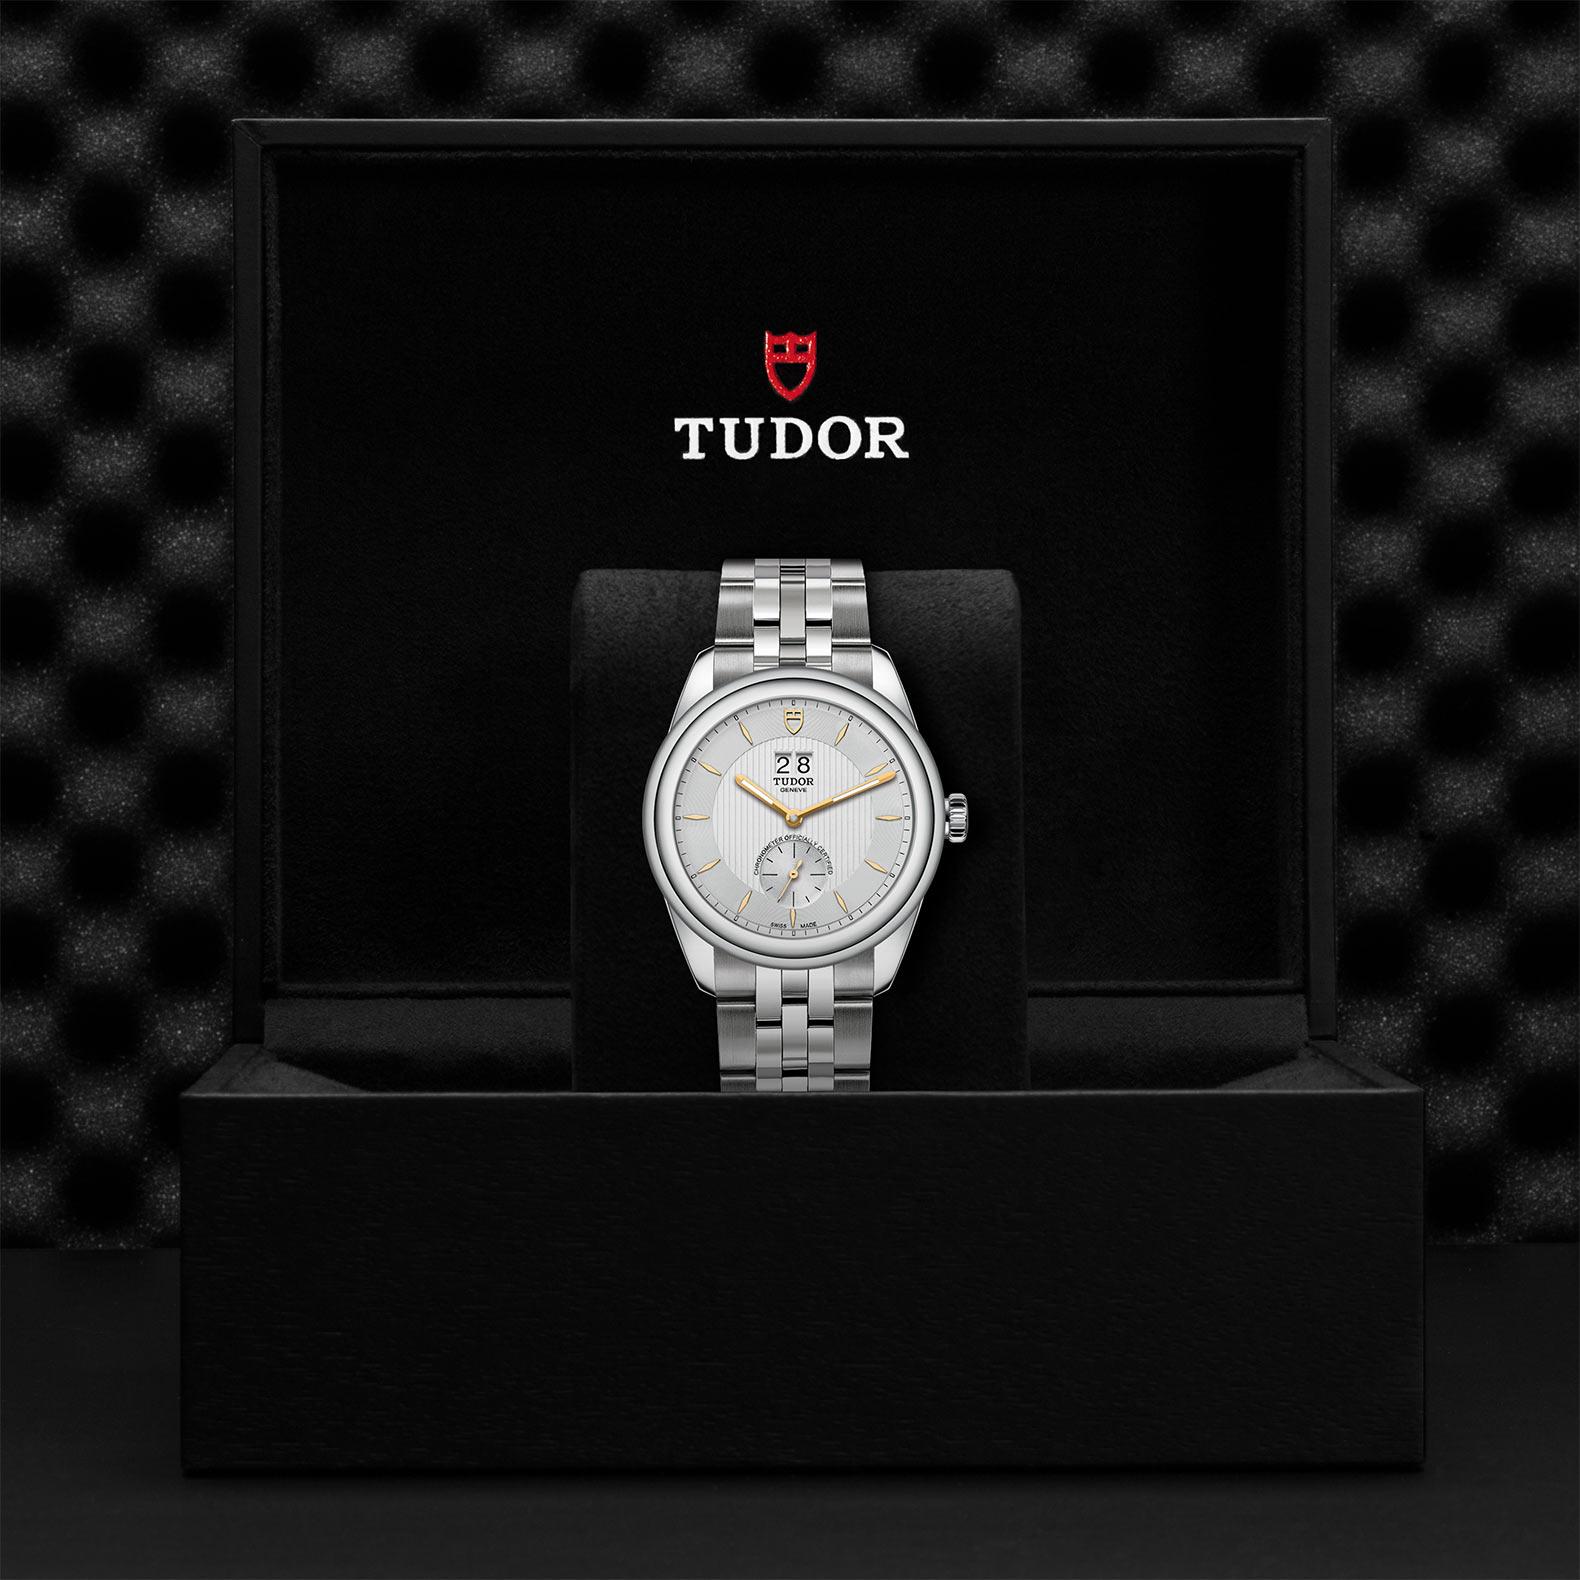 TUDOR Glamour Double Date - M57100-0002